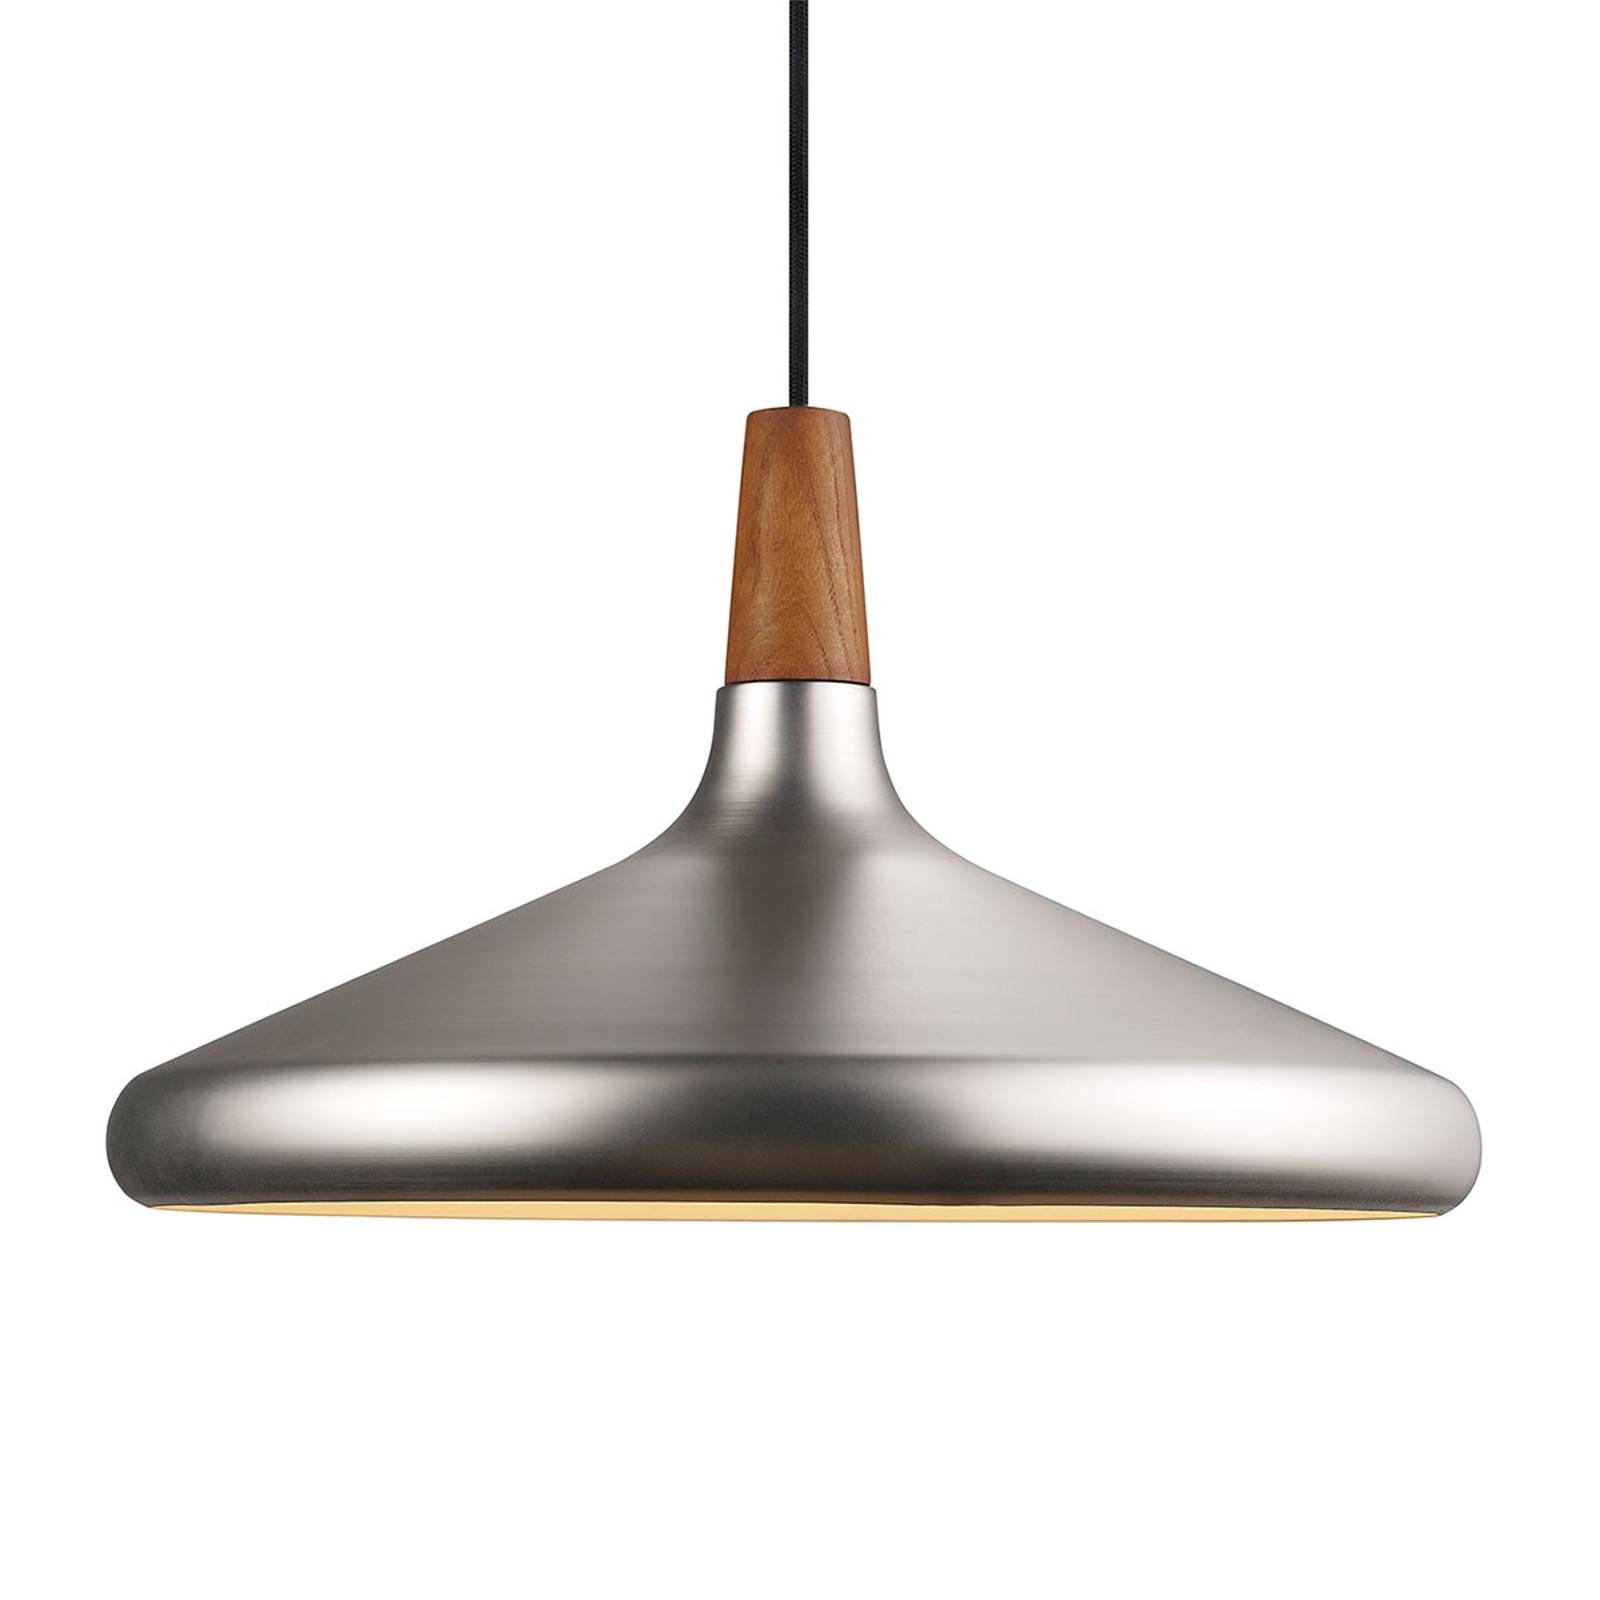 Lampa wisząca Float, 39 cm, stal